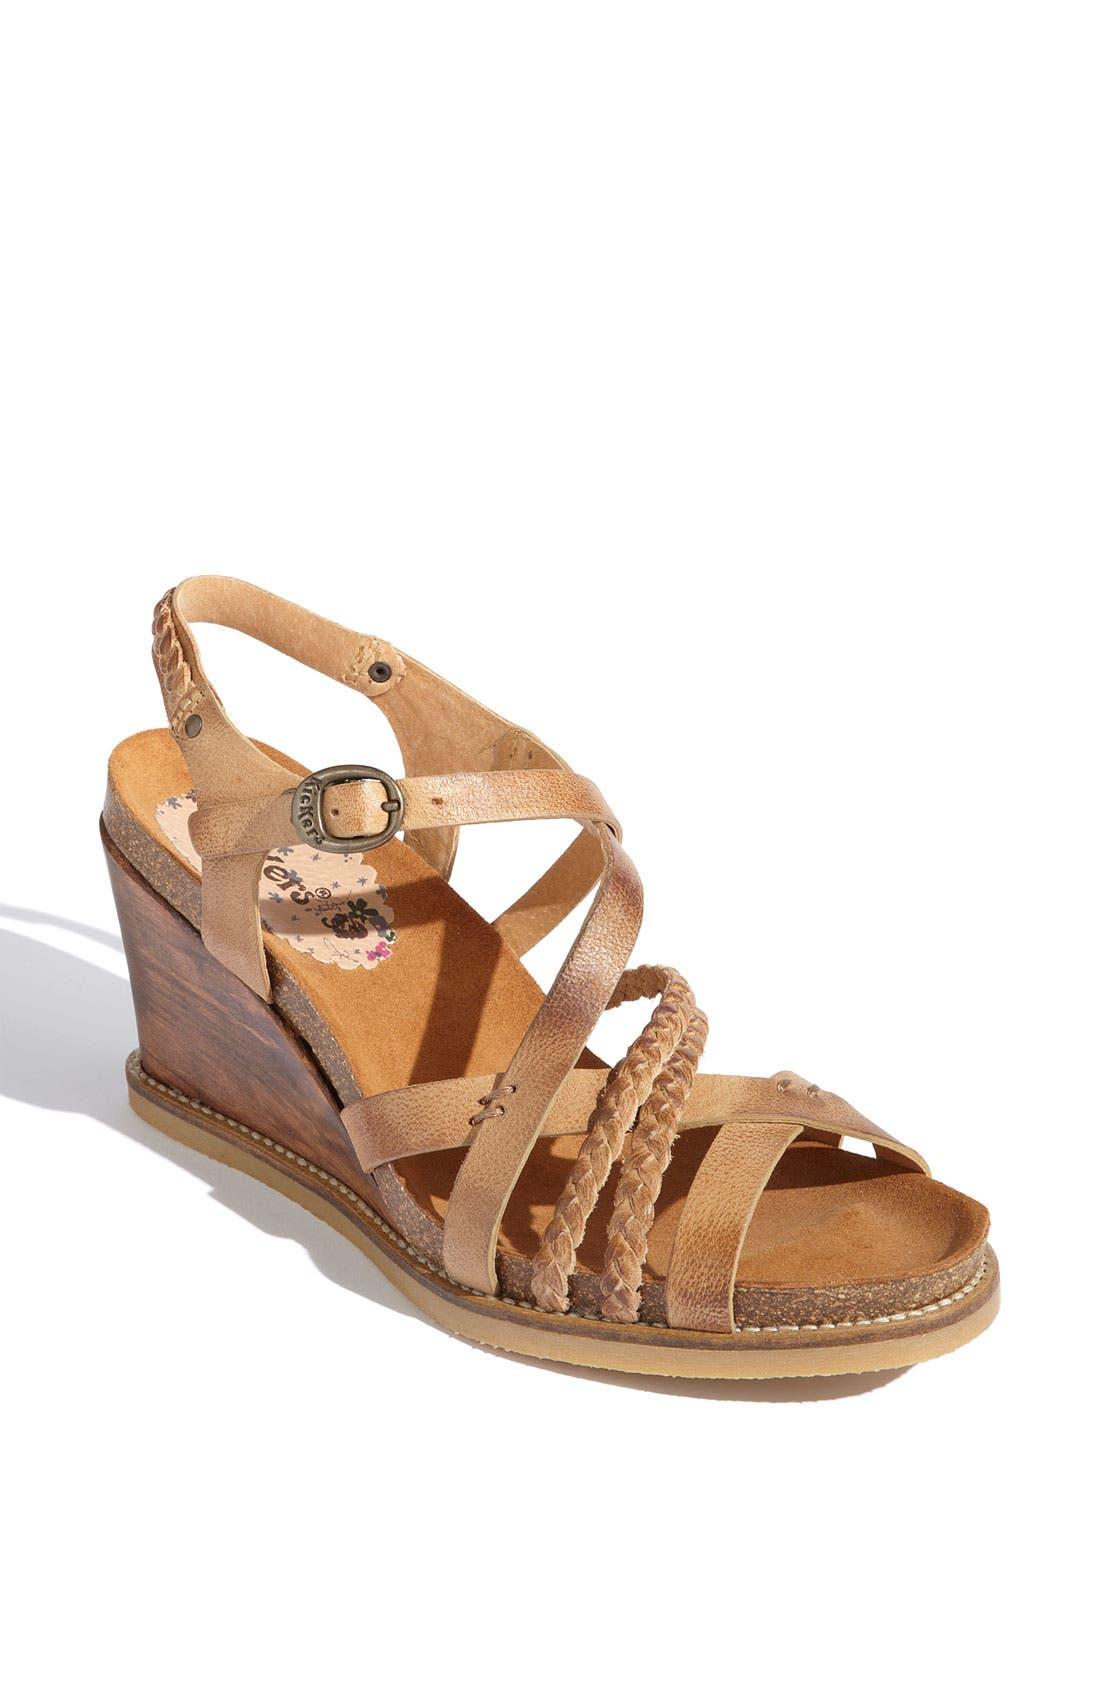 Main Image - Kickers 'Ufeel' Sandal